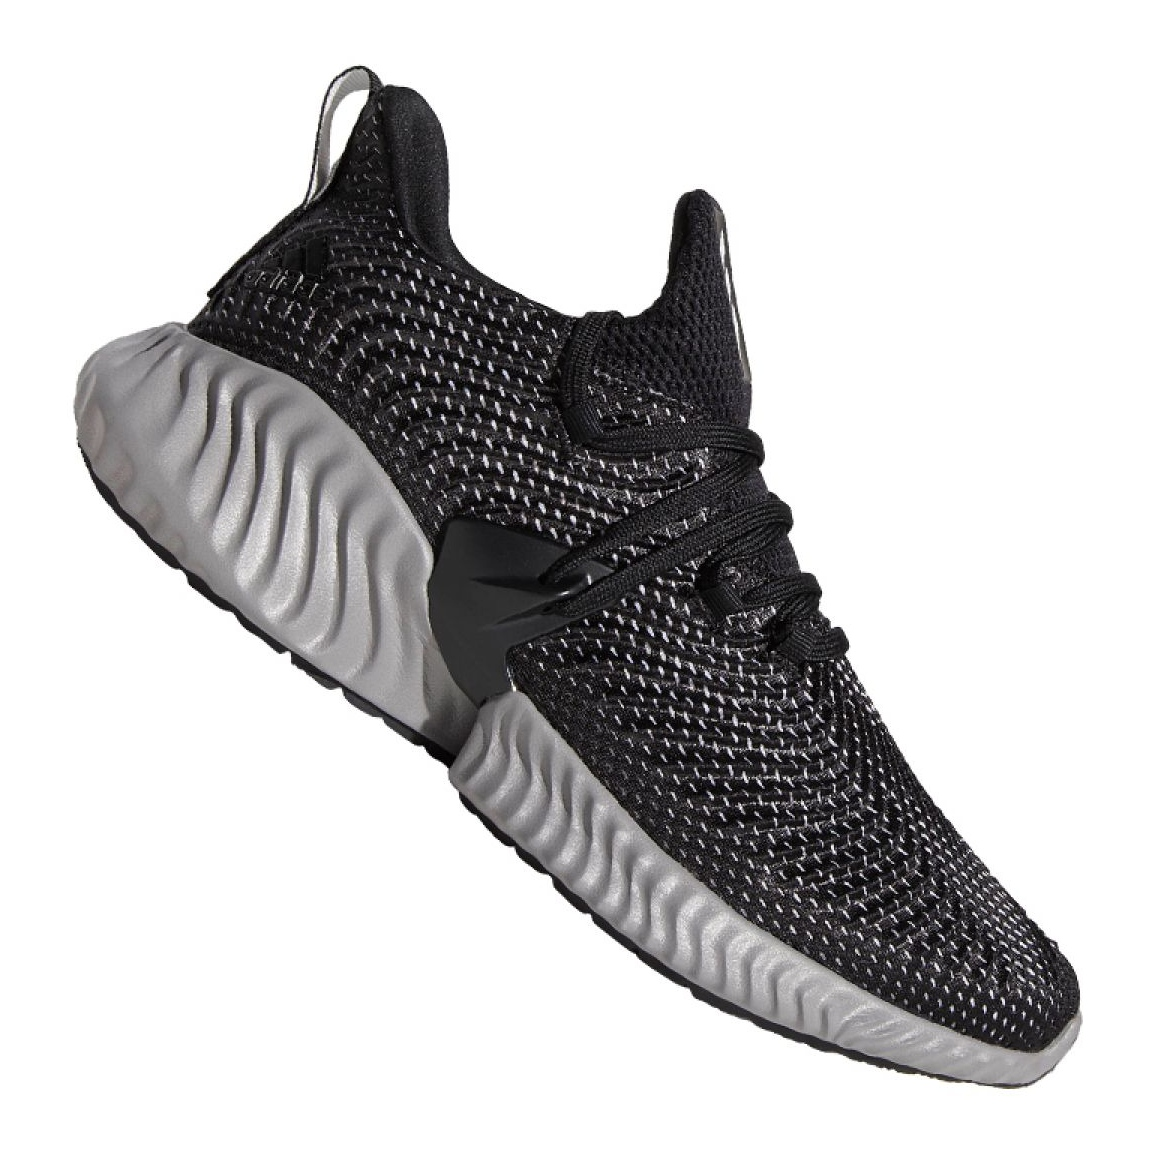 Adidas Alphabounce Instinct BC0626 sko